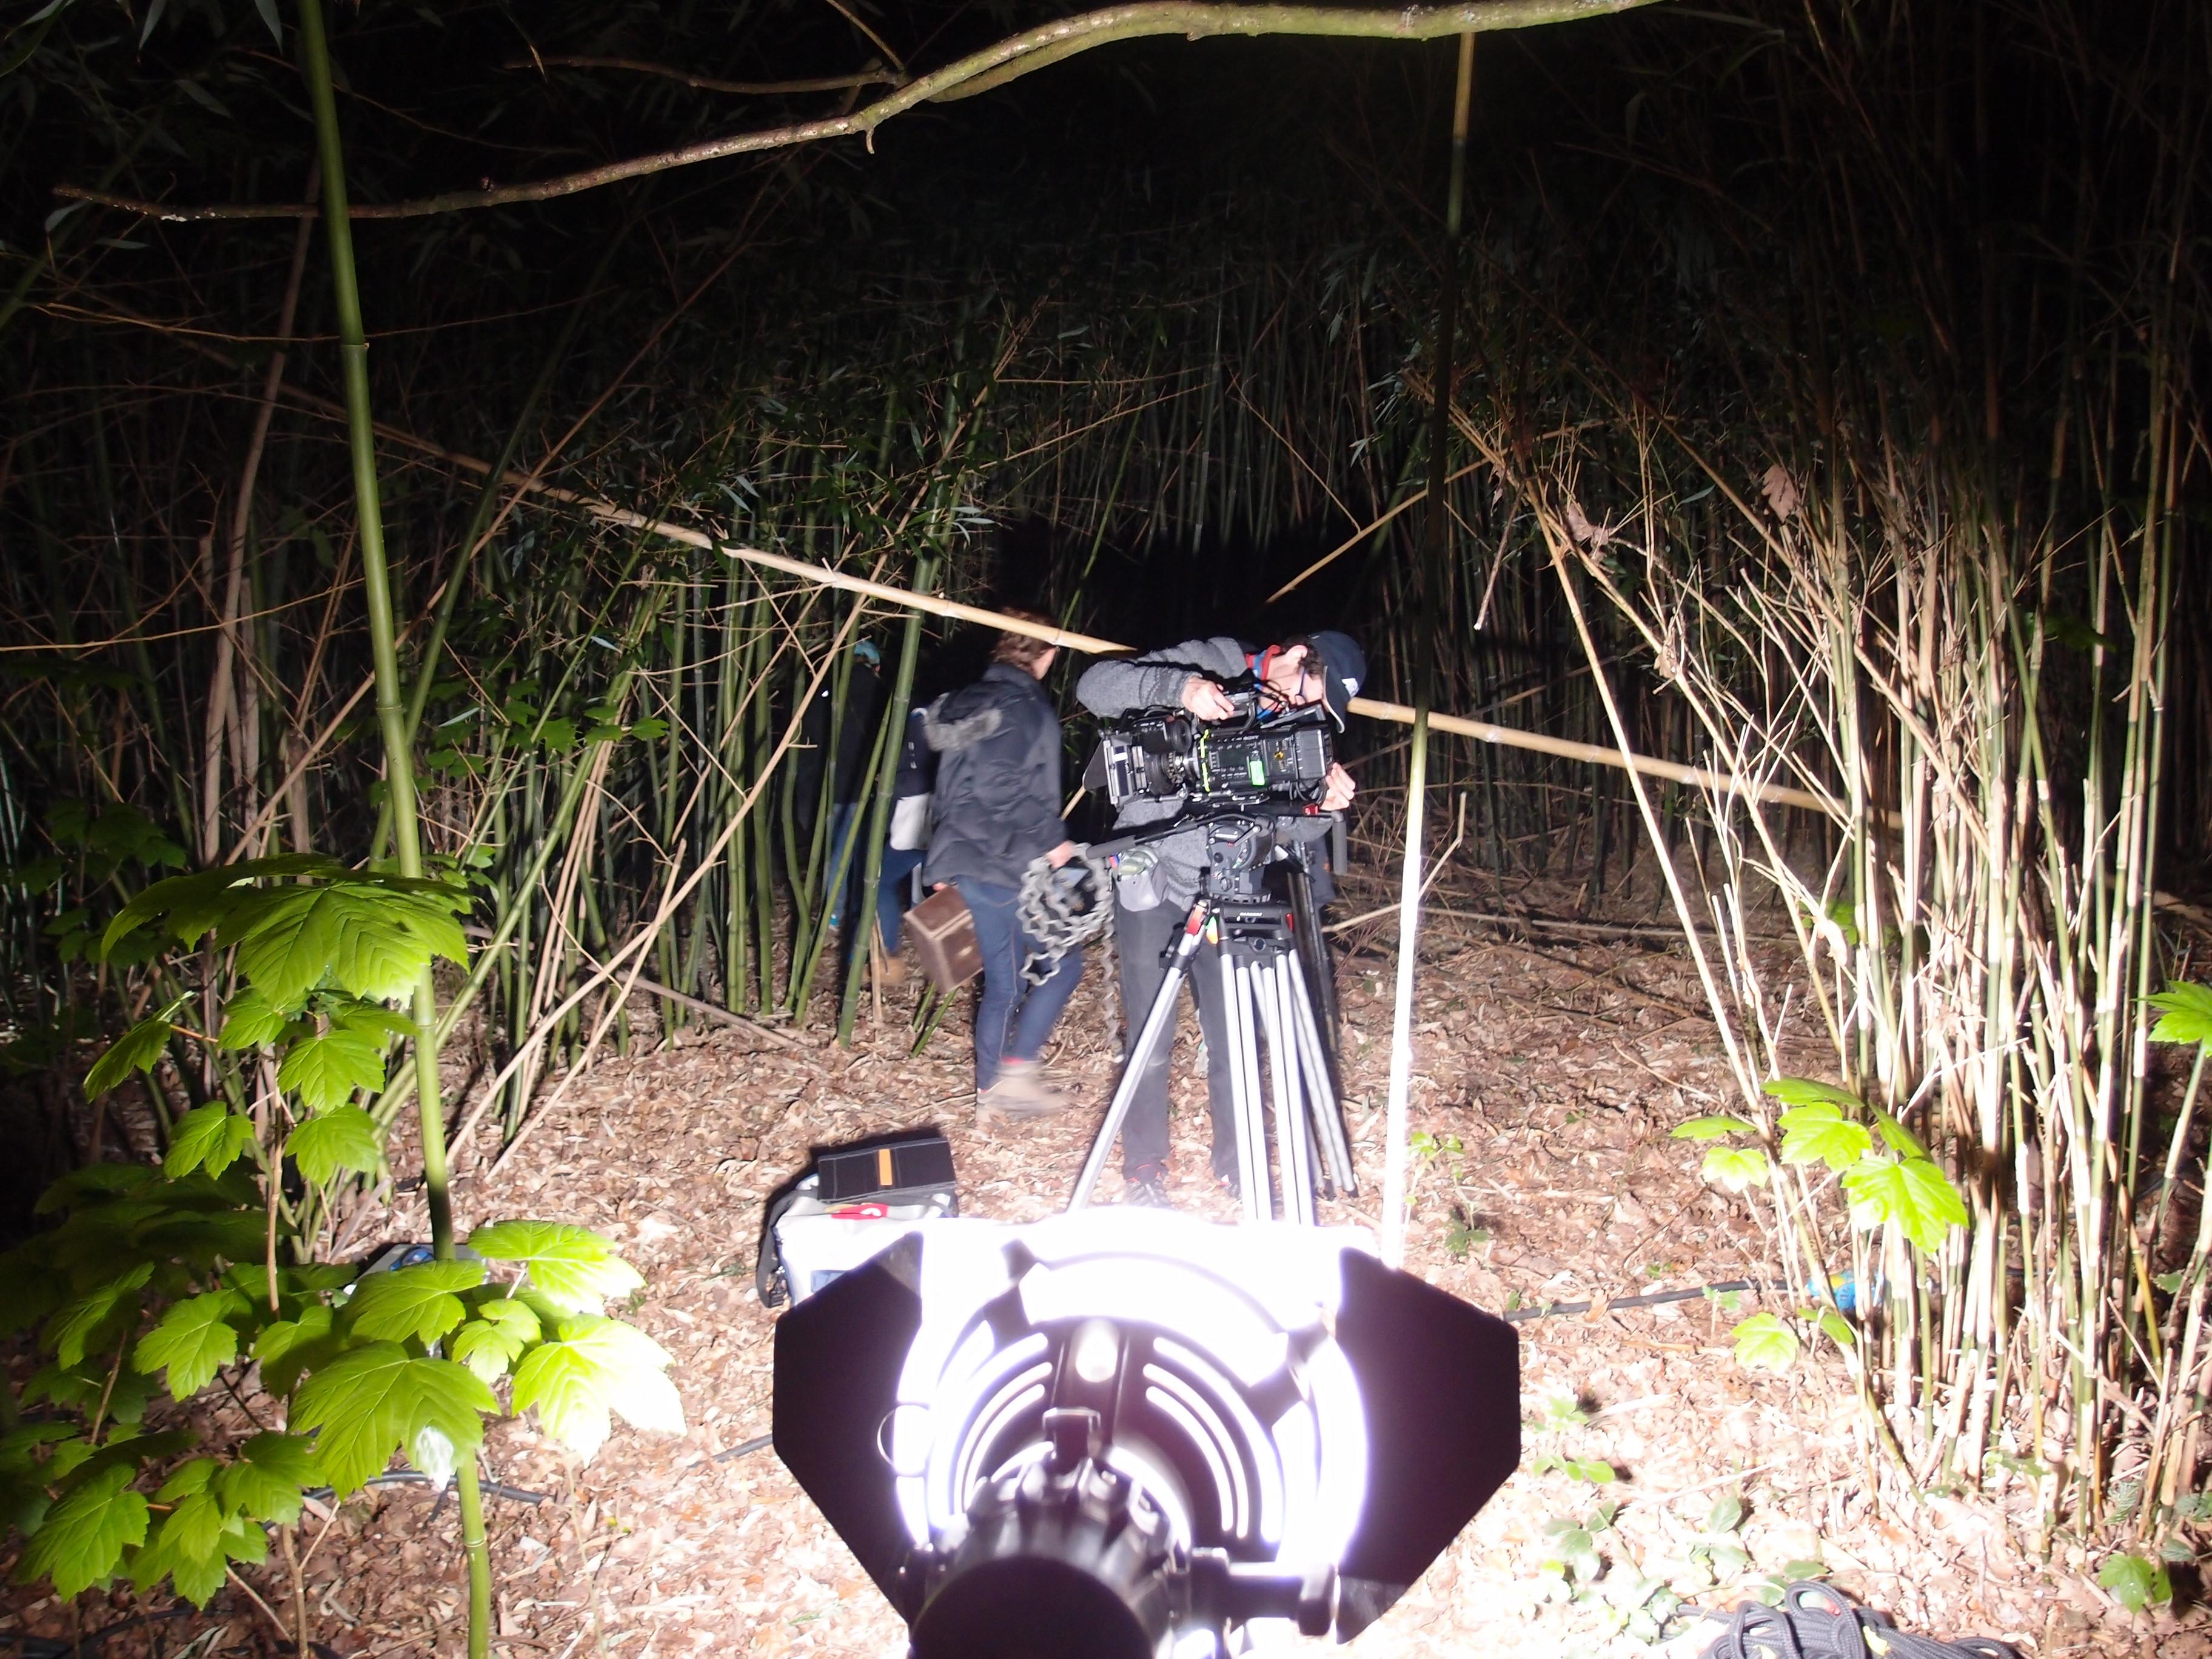 tournage nocturne